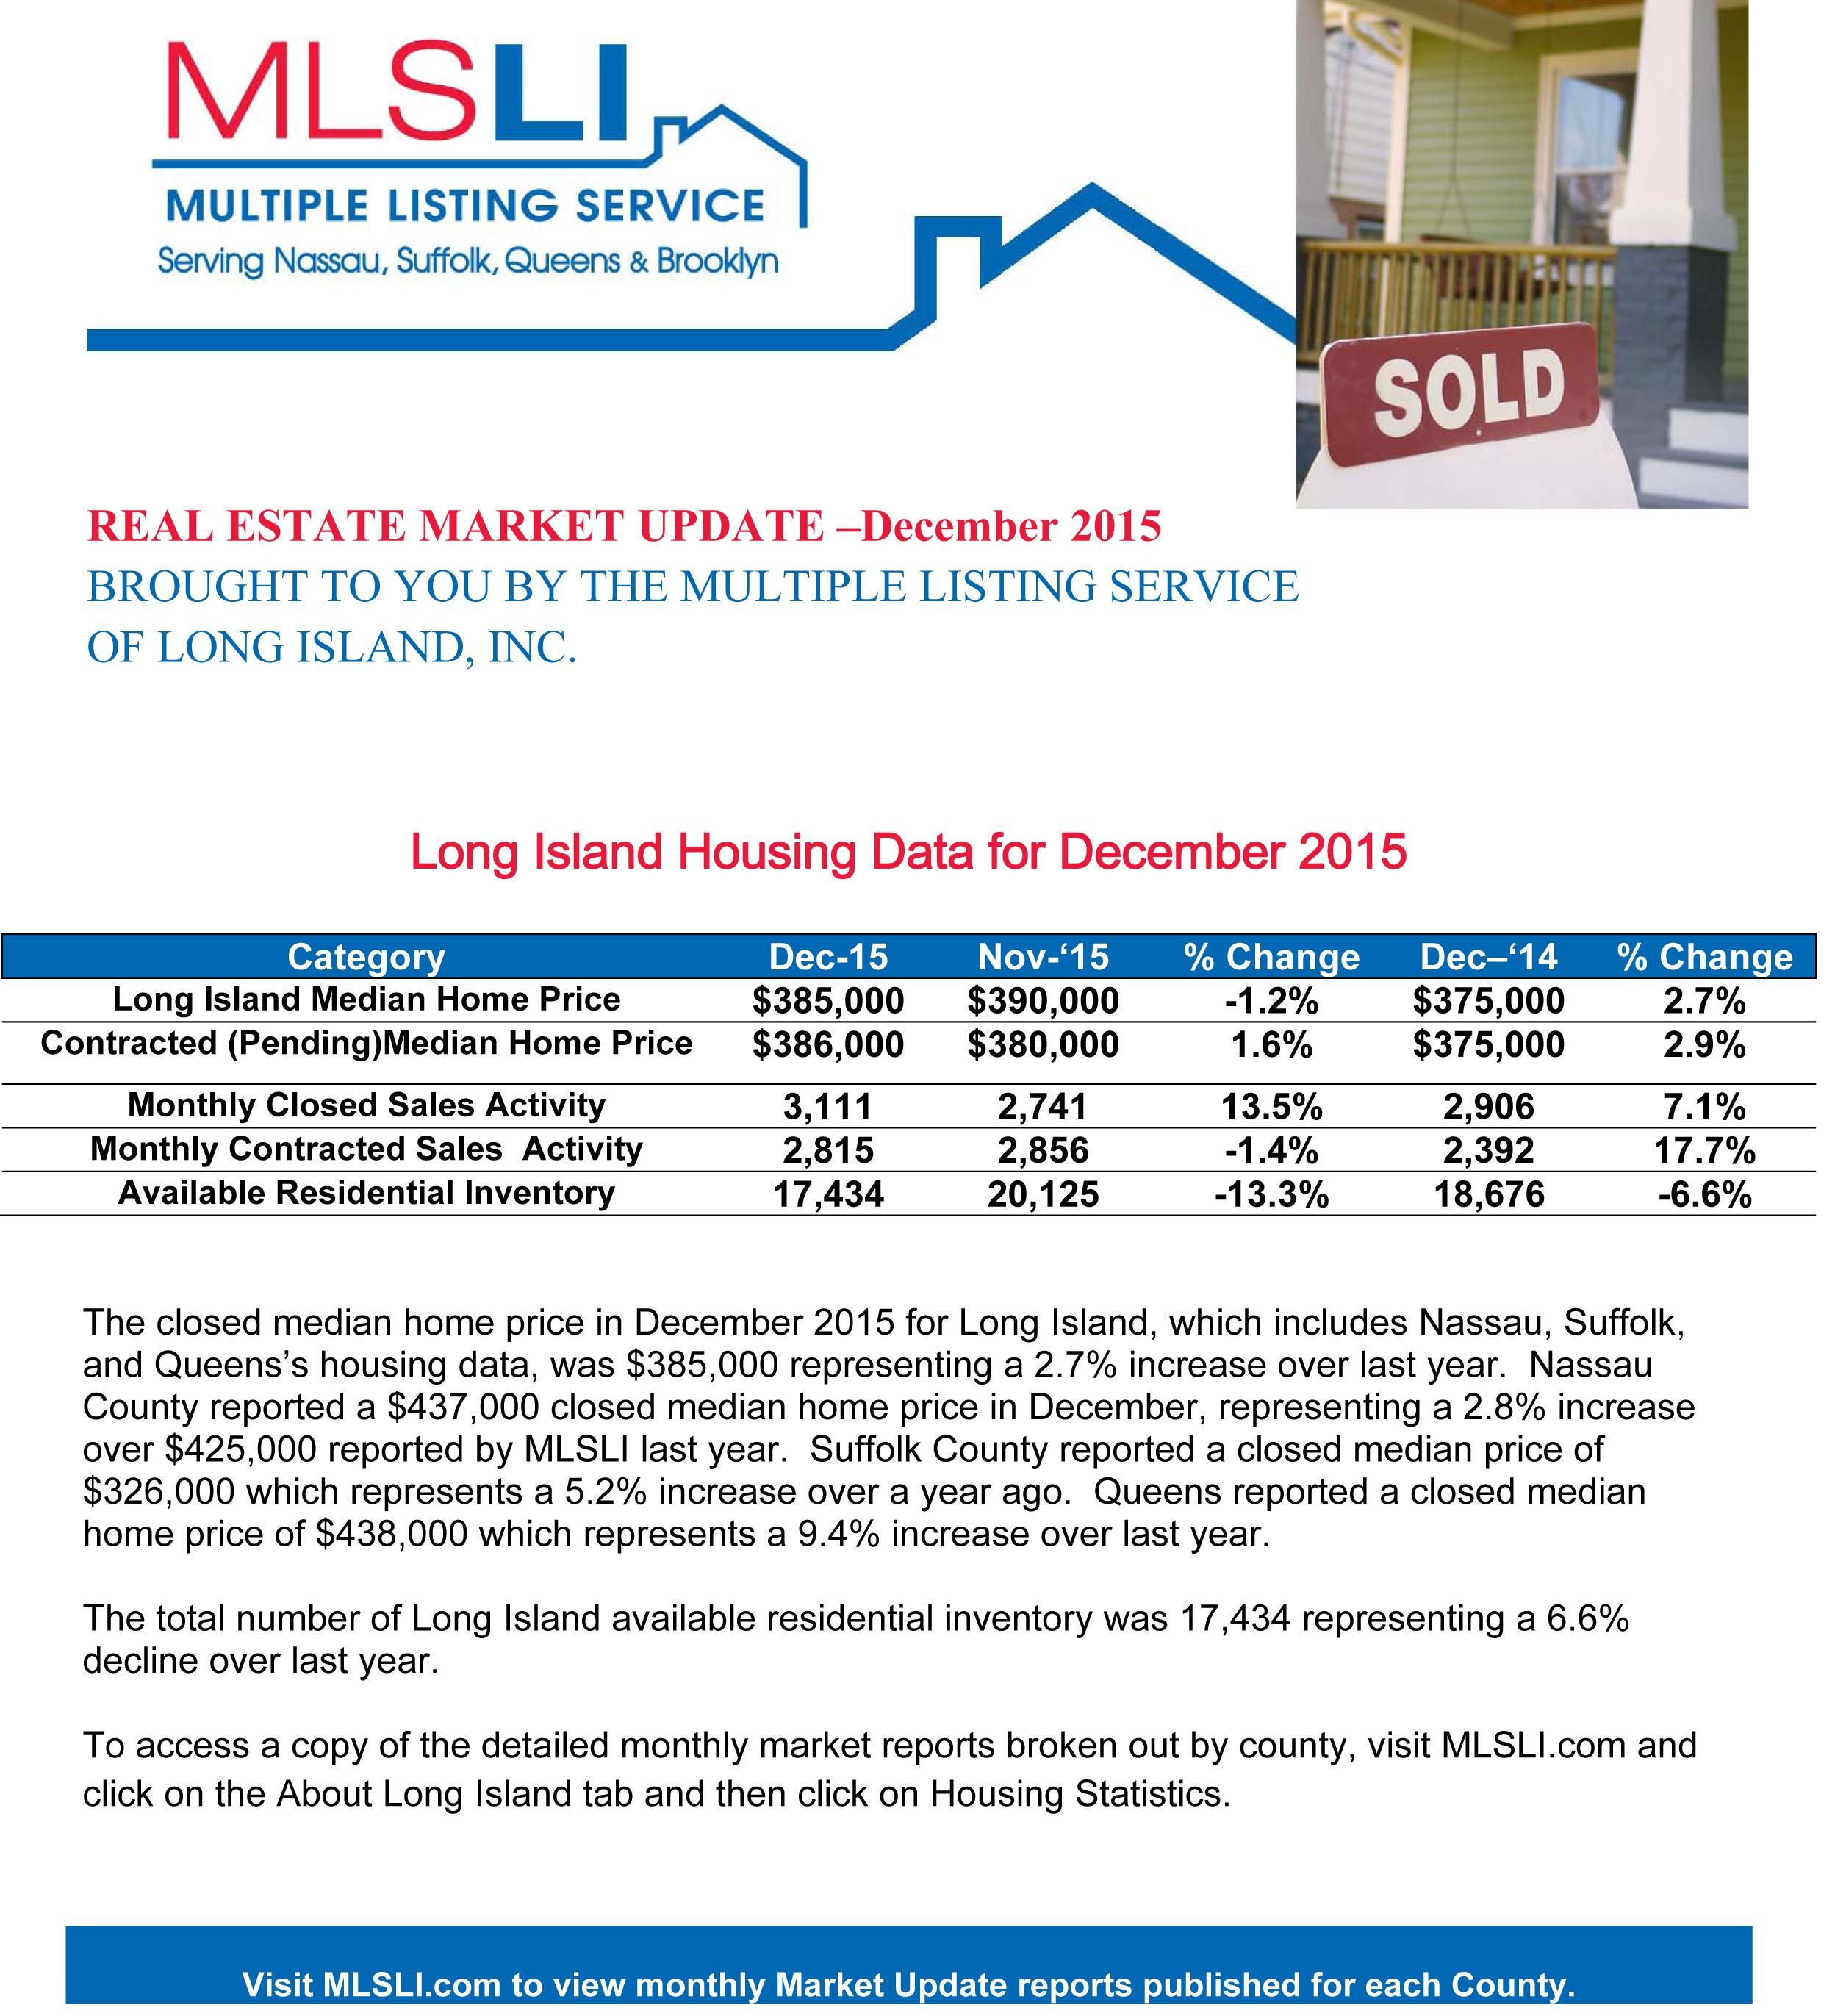 Microsoft Word - december 2015 highlight sheet